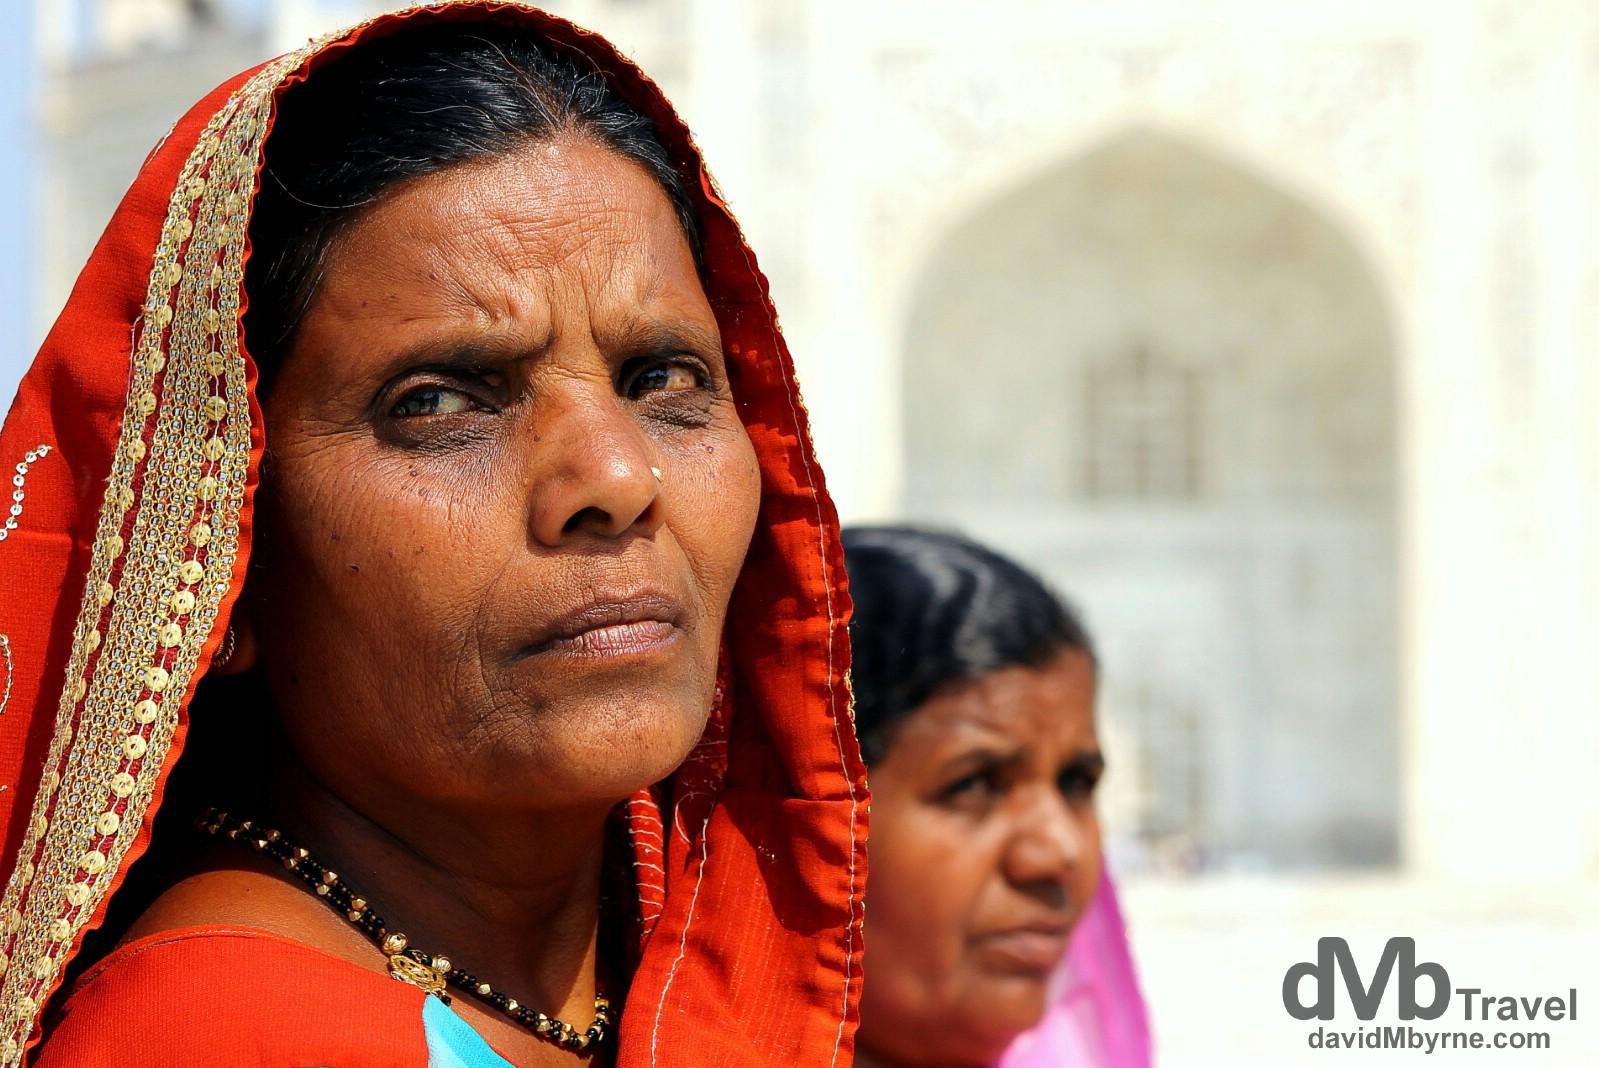 Faces fronting the Taj Mahal in Agra, Uttar Pradesh, India. October 11th 2012.